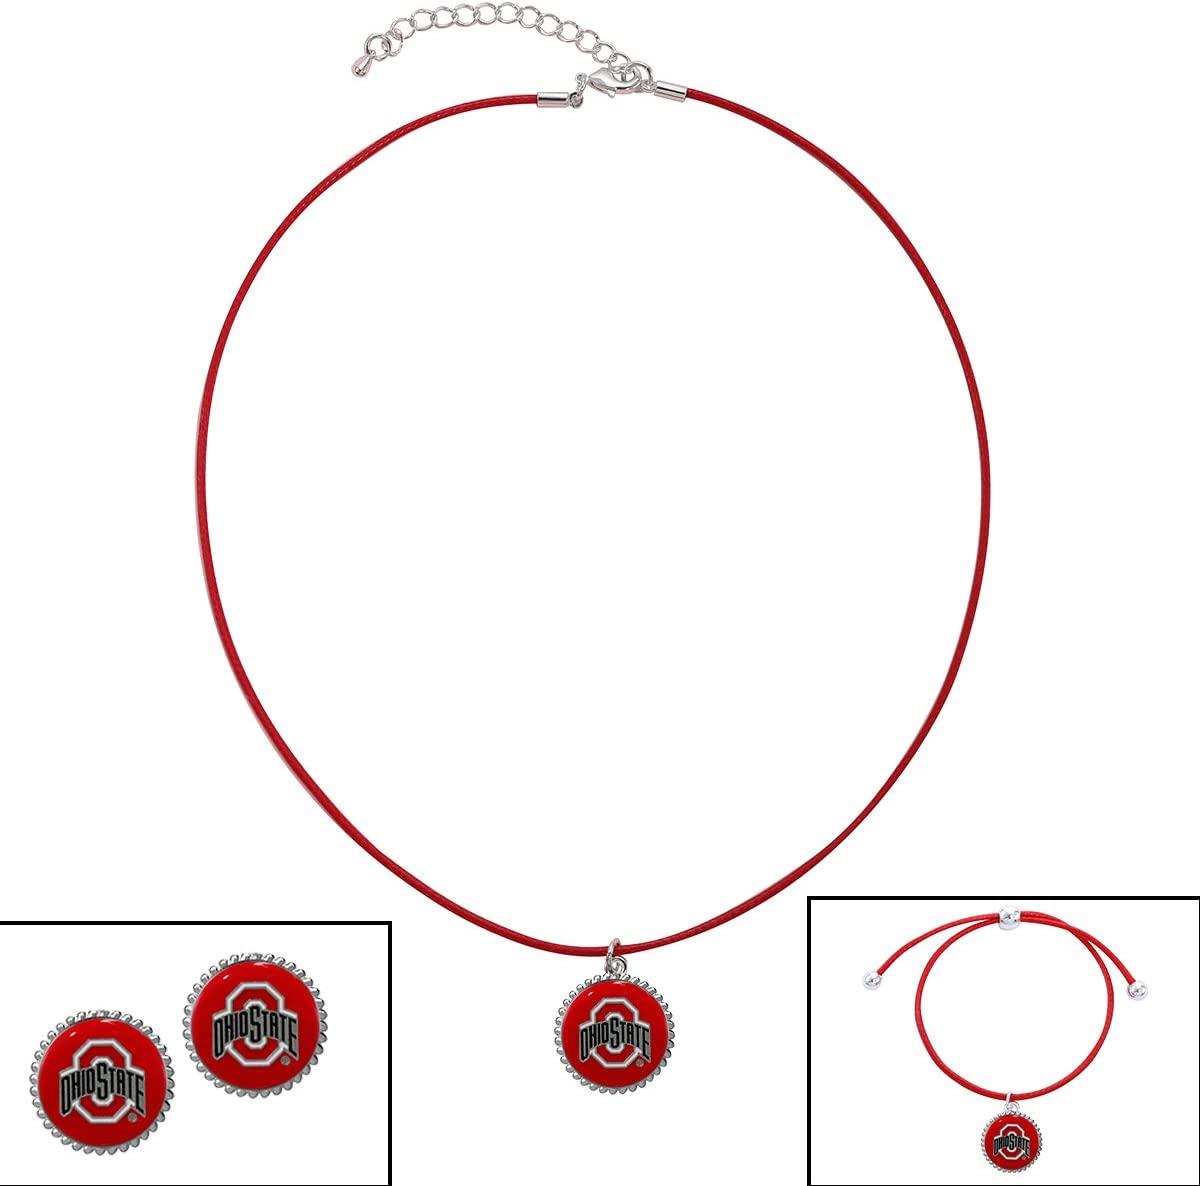 SANDOL Ohio State Cord Jewelry Combo (Bracelet, Necklace, Earrings)